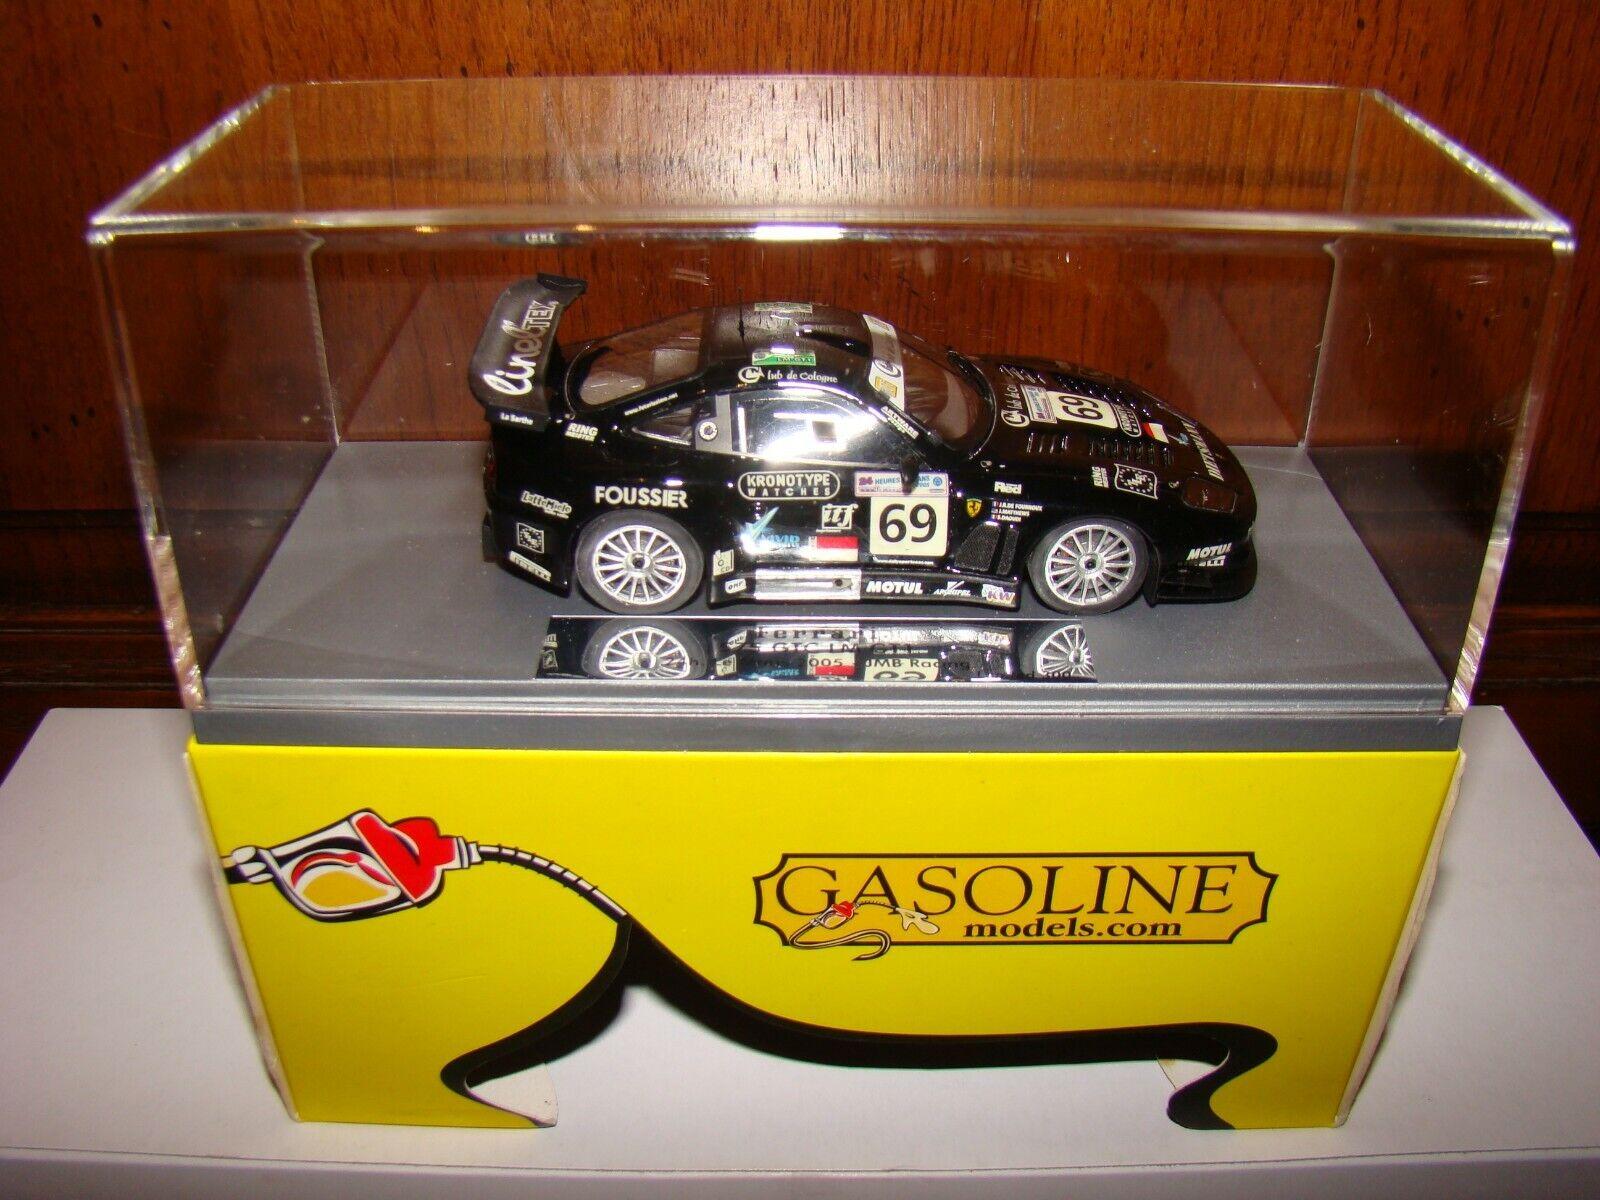 FERRARI 575 GTC LE MANS 2005 JMB RACING    BBR GAZOLINE 1 43EME LIMITED SUPERBE